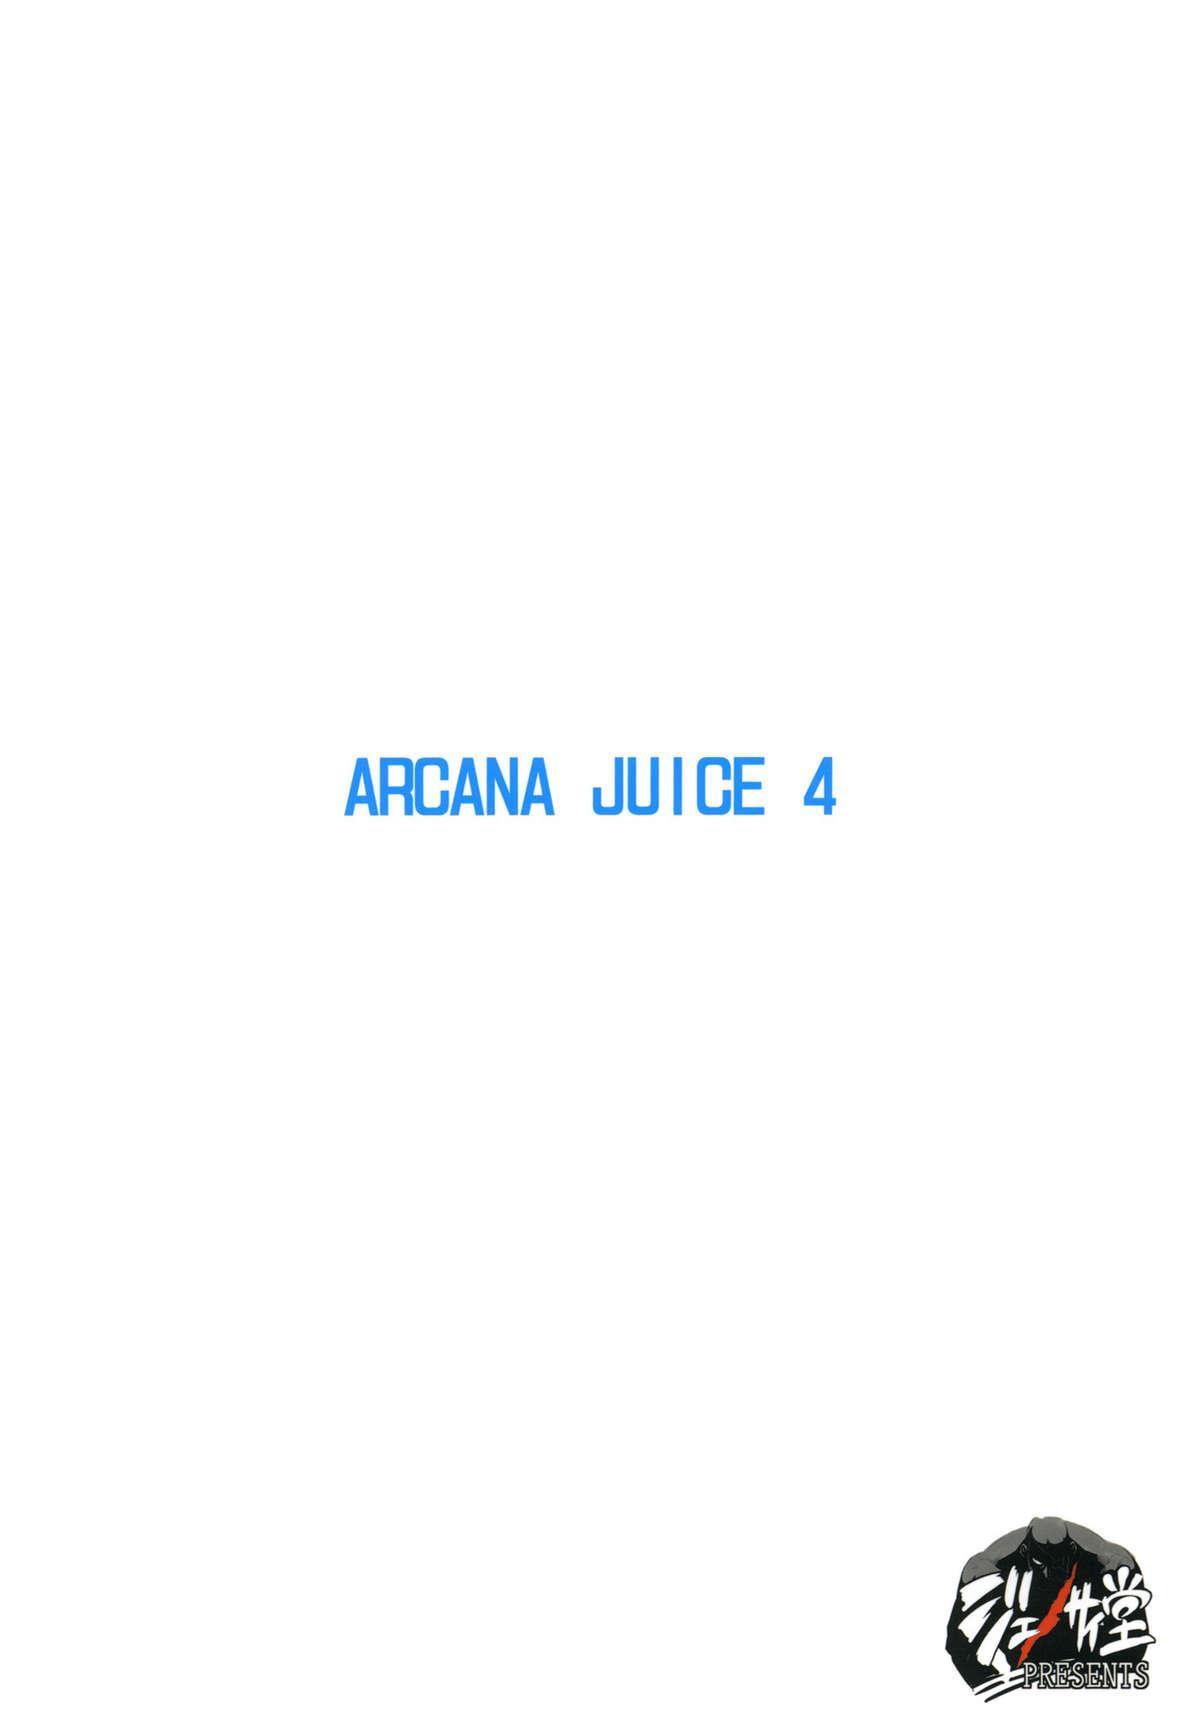 ARCANA JUICE 4 23